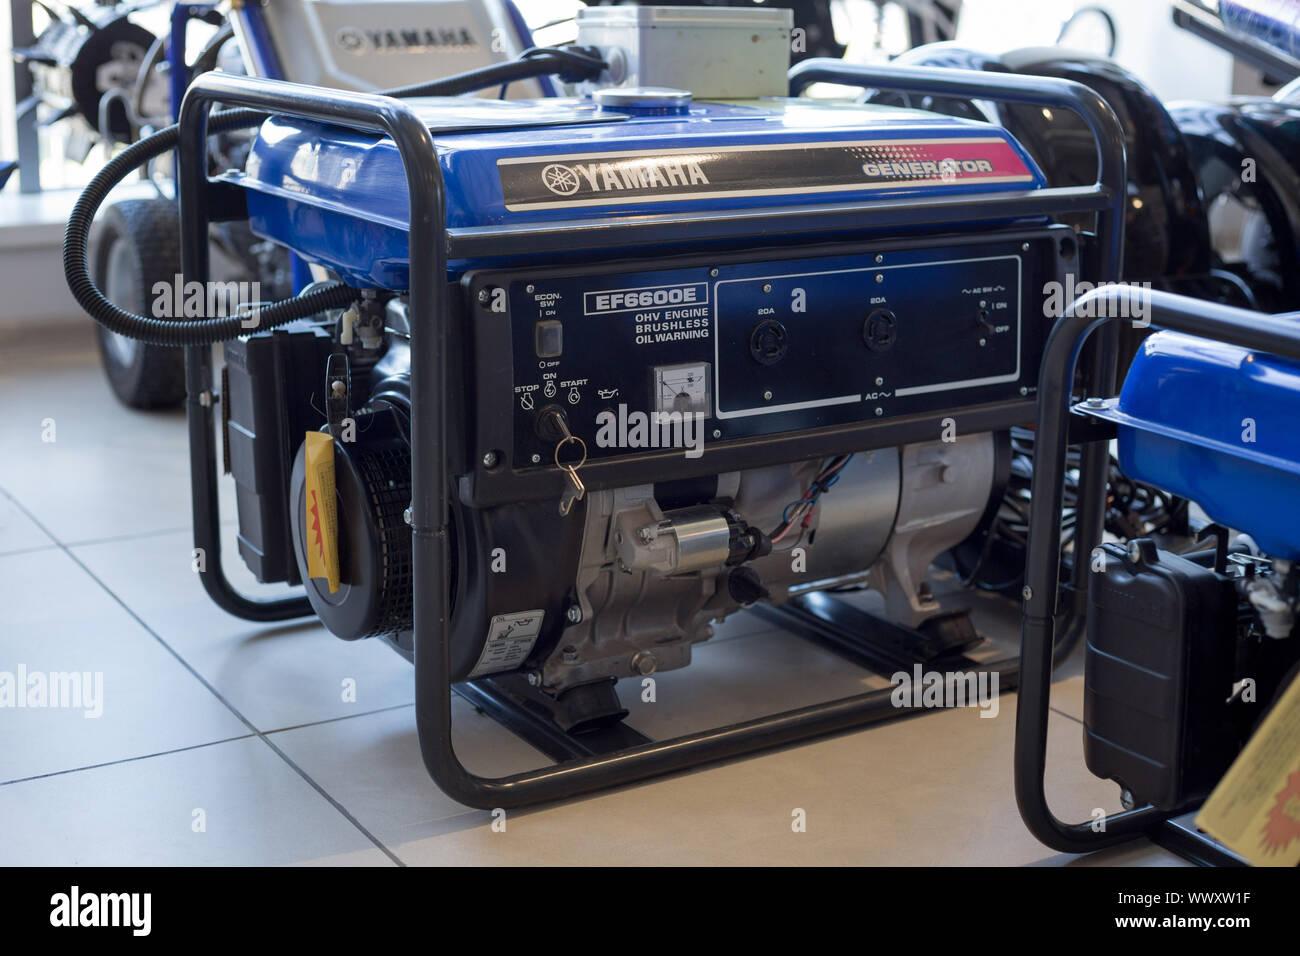 Rusia, Izhevsk - Agosto 23, 2019: Yamaha showroom. Generador Diesel modernos Yamaha EF6600E. La famosa marca mundial. Foto de stock